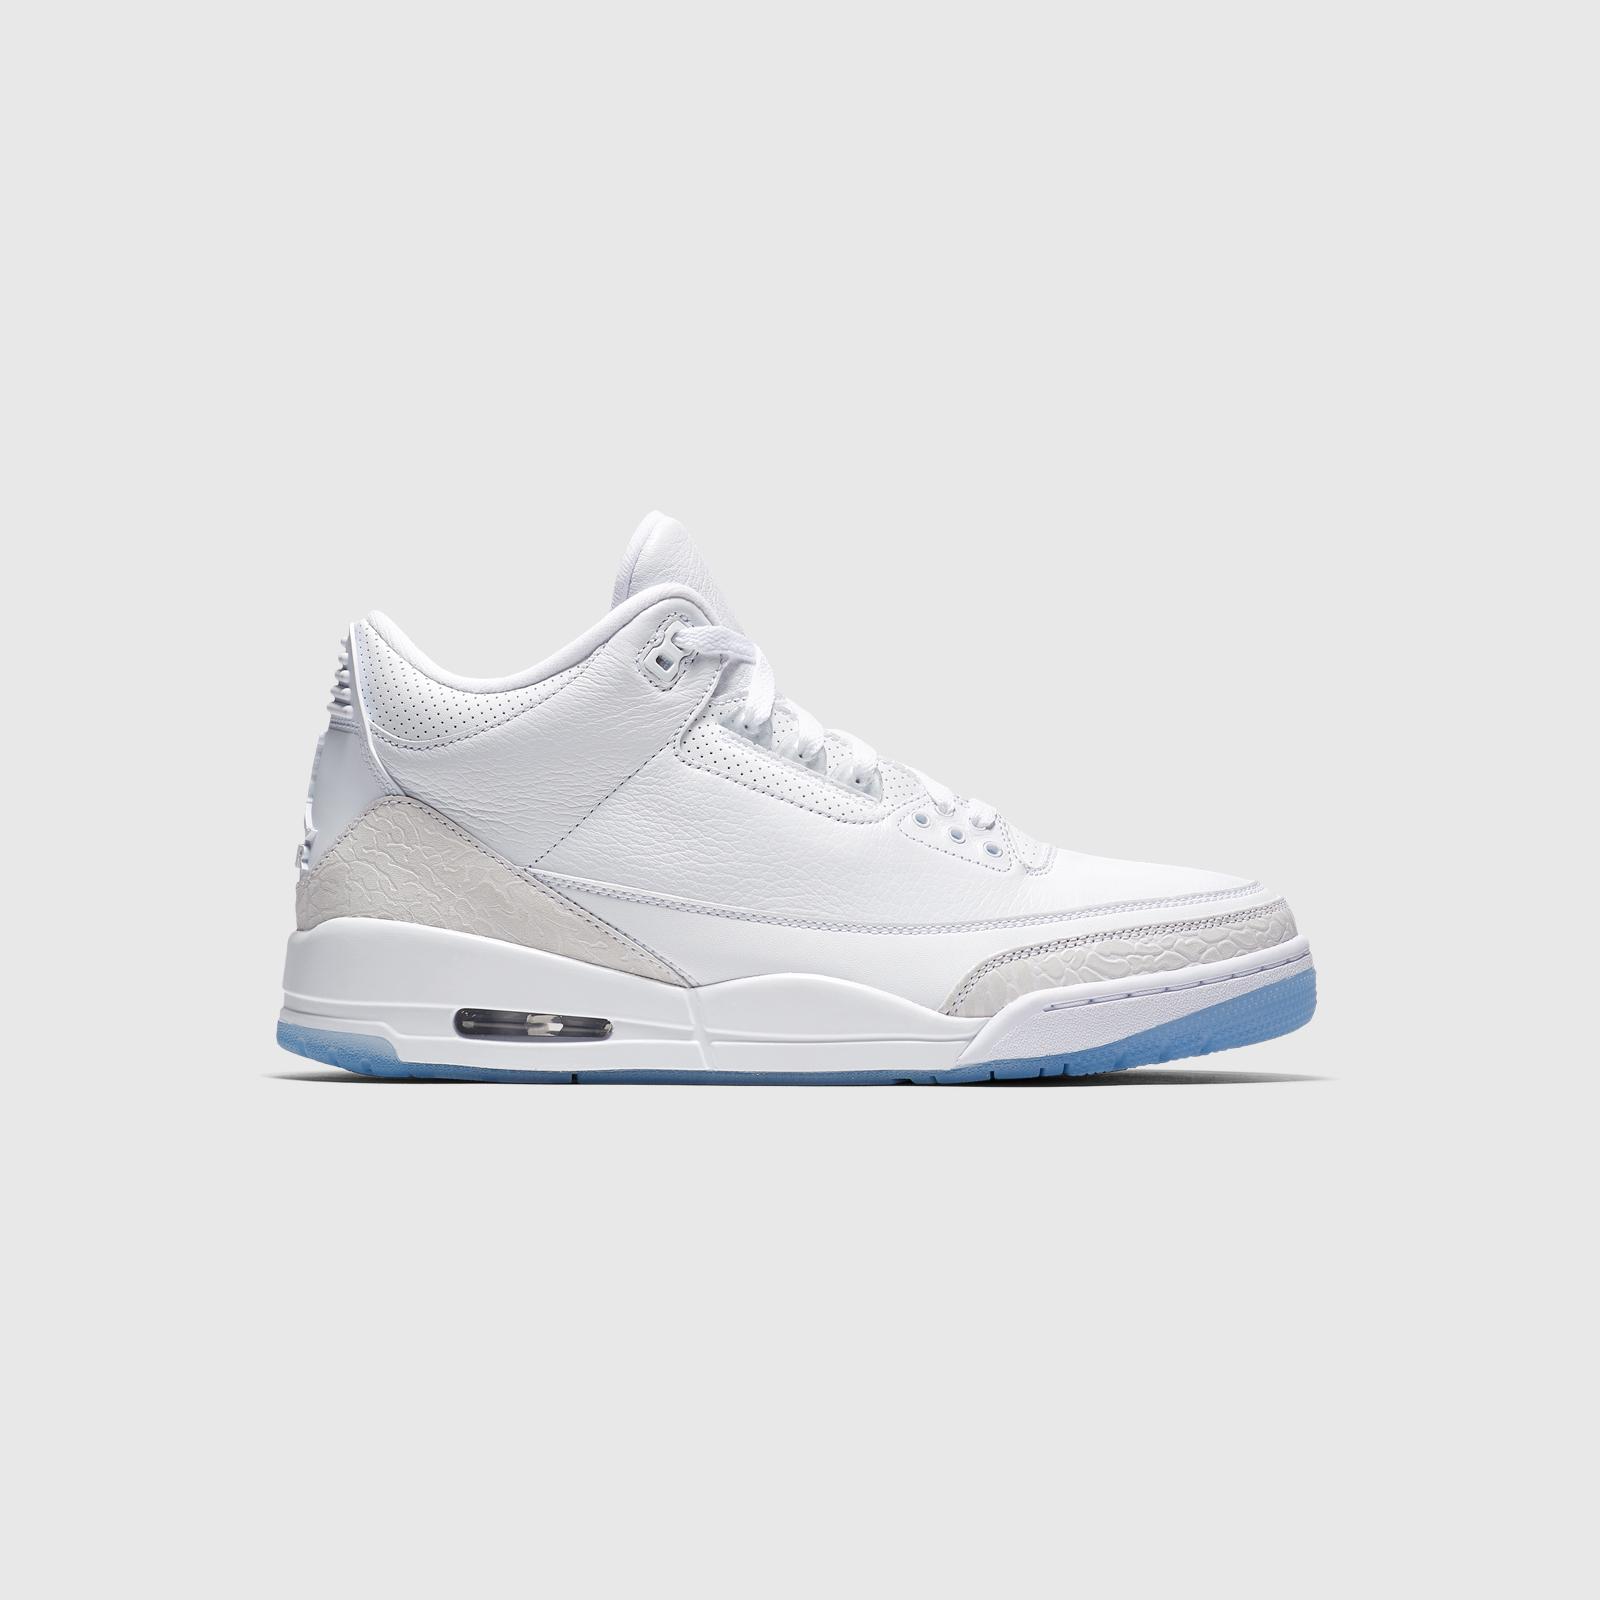 check out d6d1c 4e108 Air Jordan 3 Retro 'Pure White' Release Date